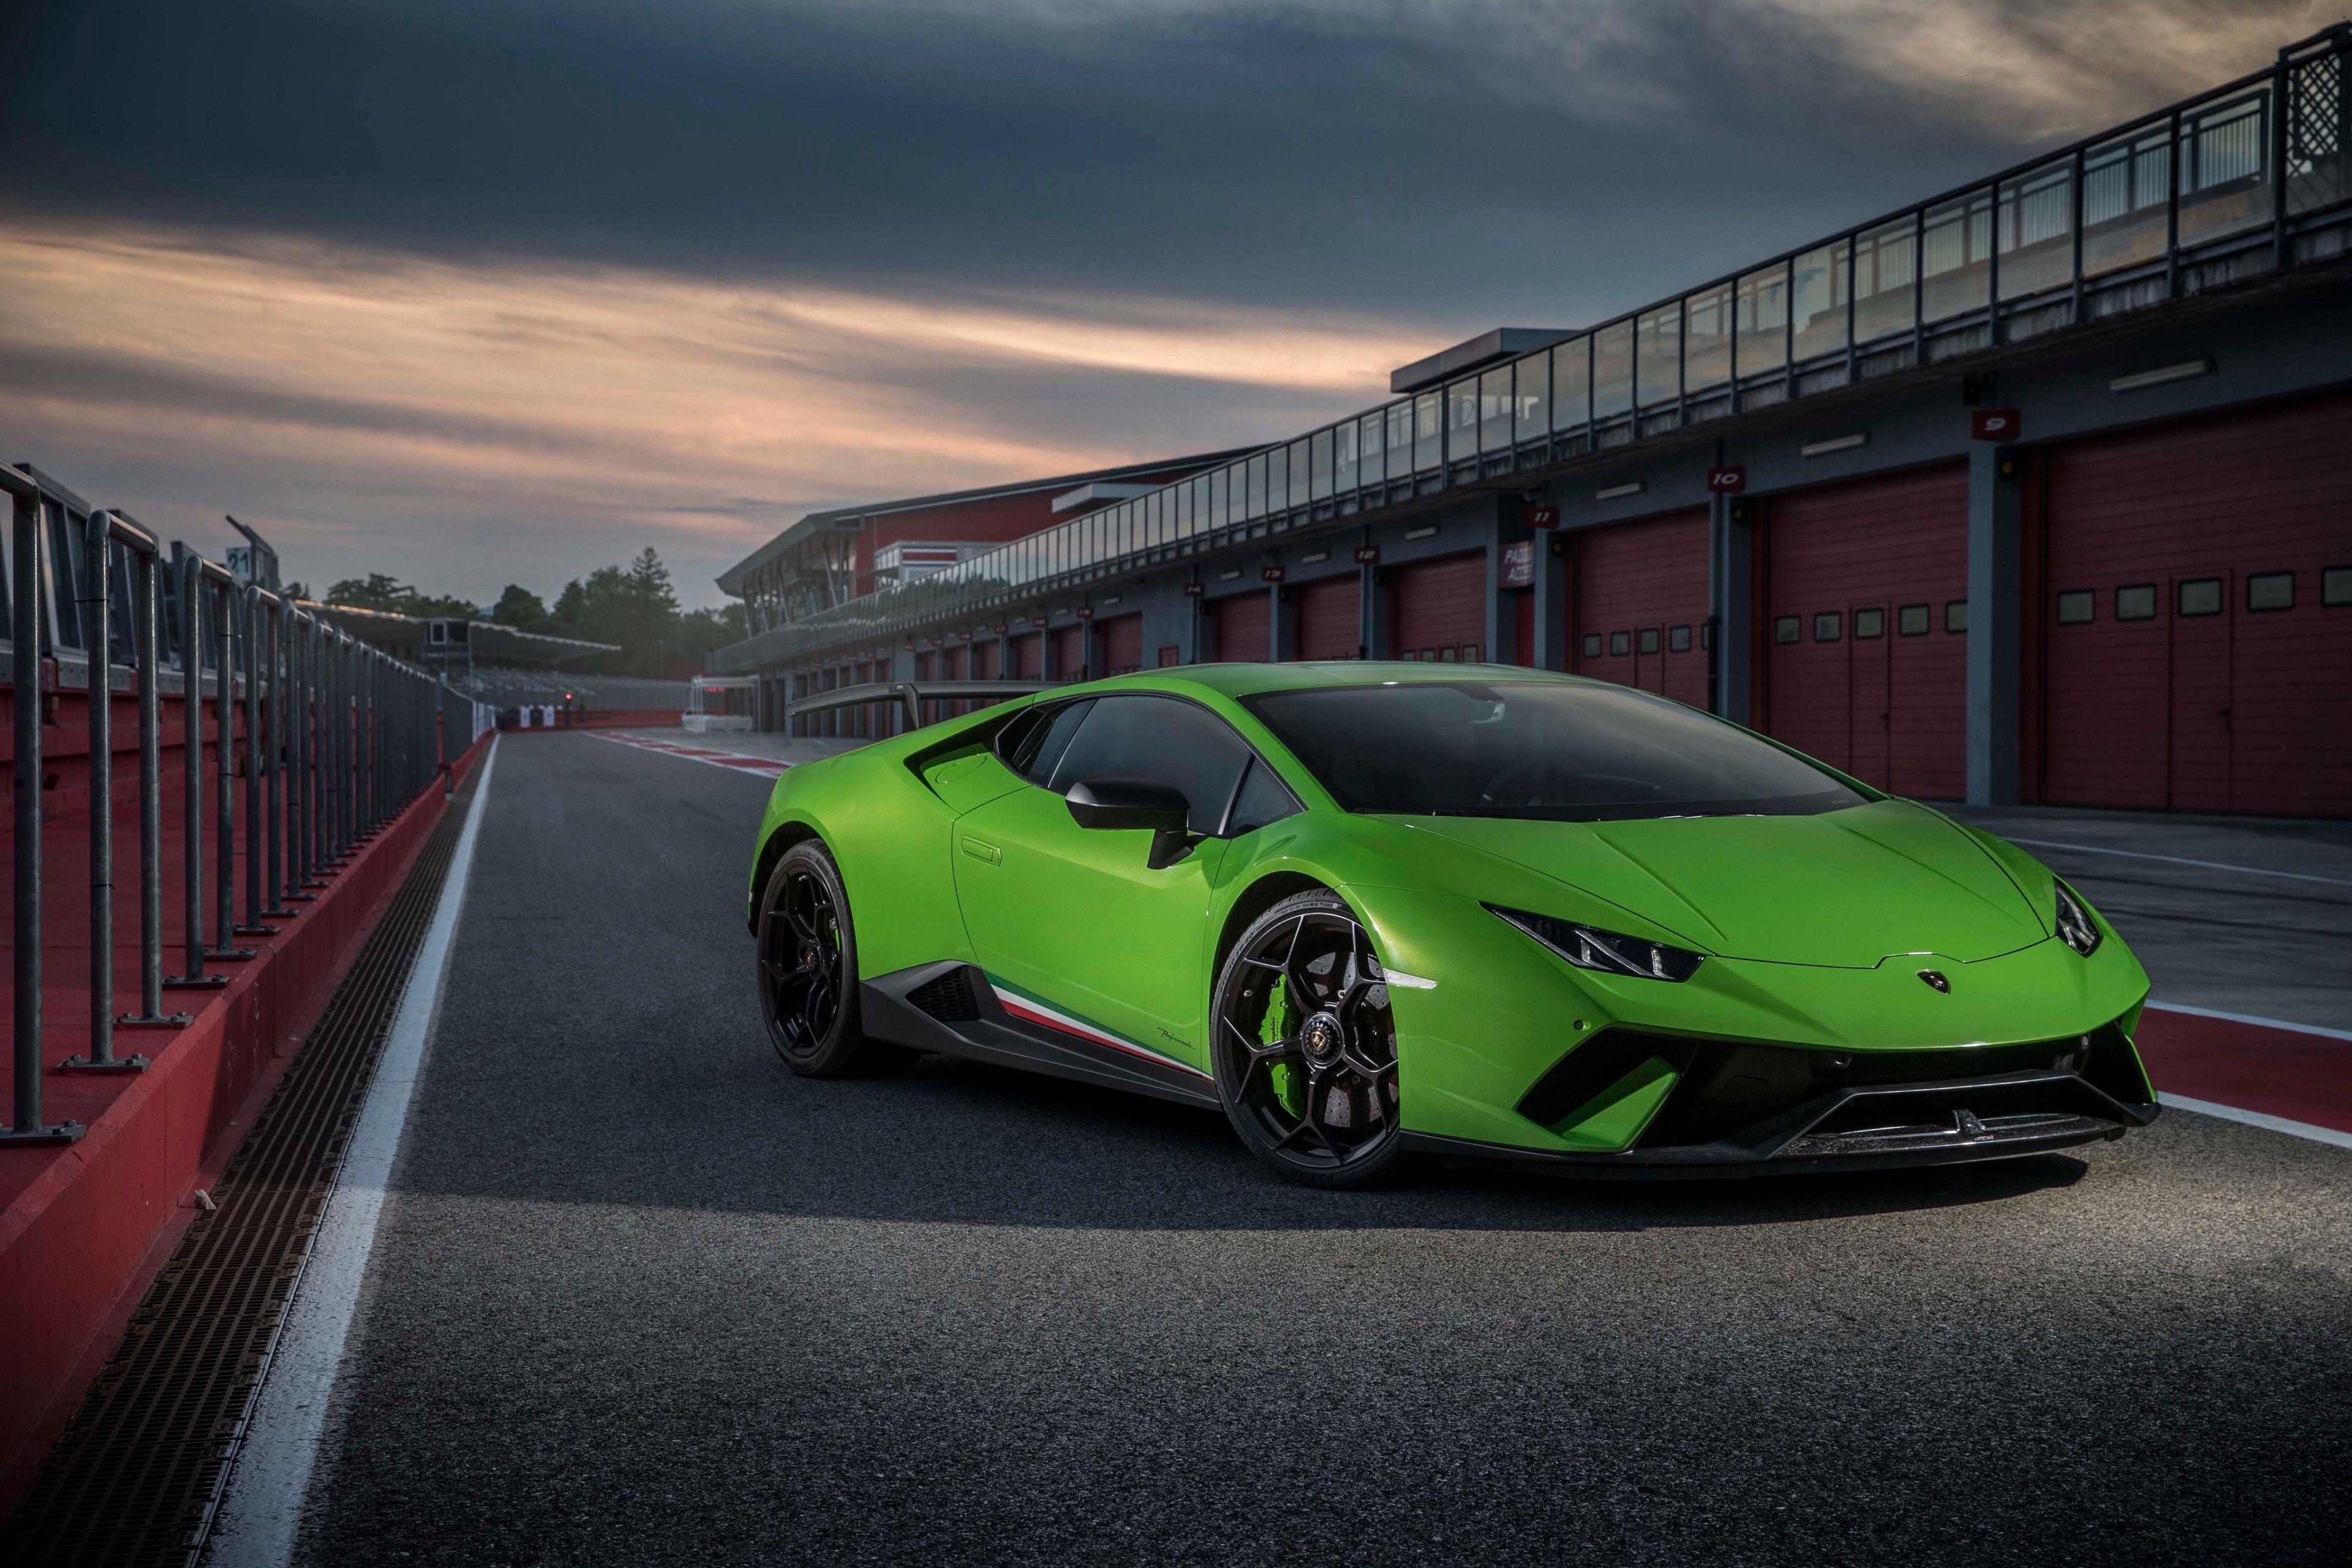 3840x2560 Lamborghini Huracan Performante 4k Wallpaper For Pc In Hd